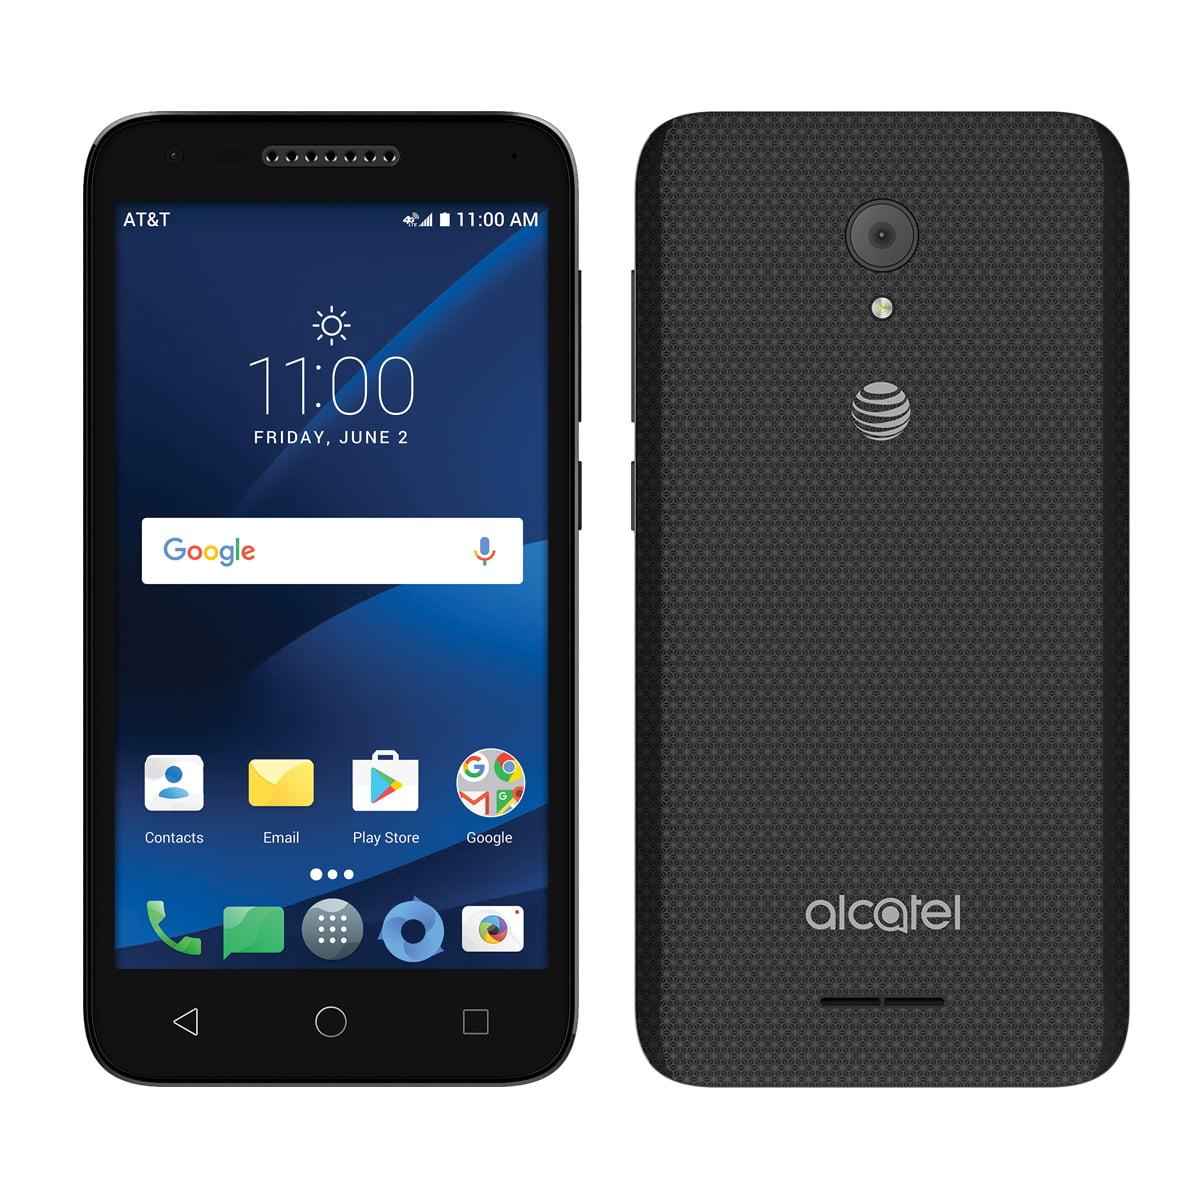 Alcatel Ideal Xcite 5044R 4G LTE GSM Unlocked (AT&T) Smartphone - Black - Walmart.com - Walmart.com